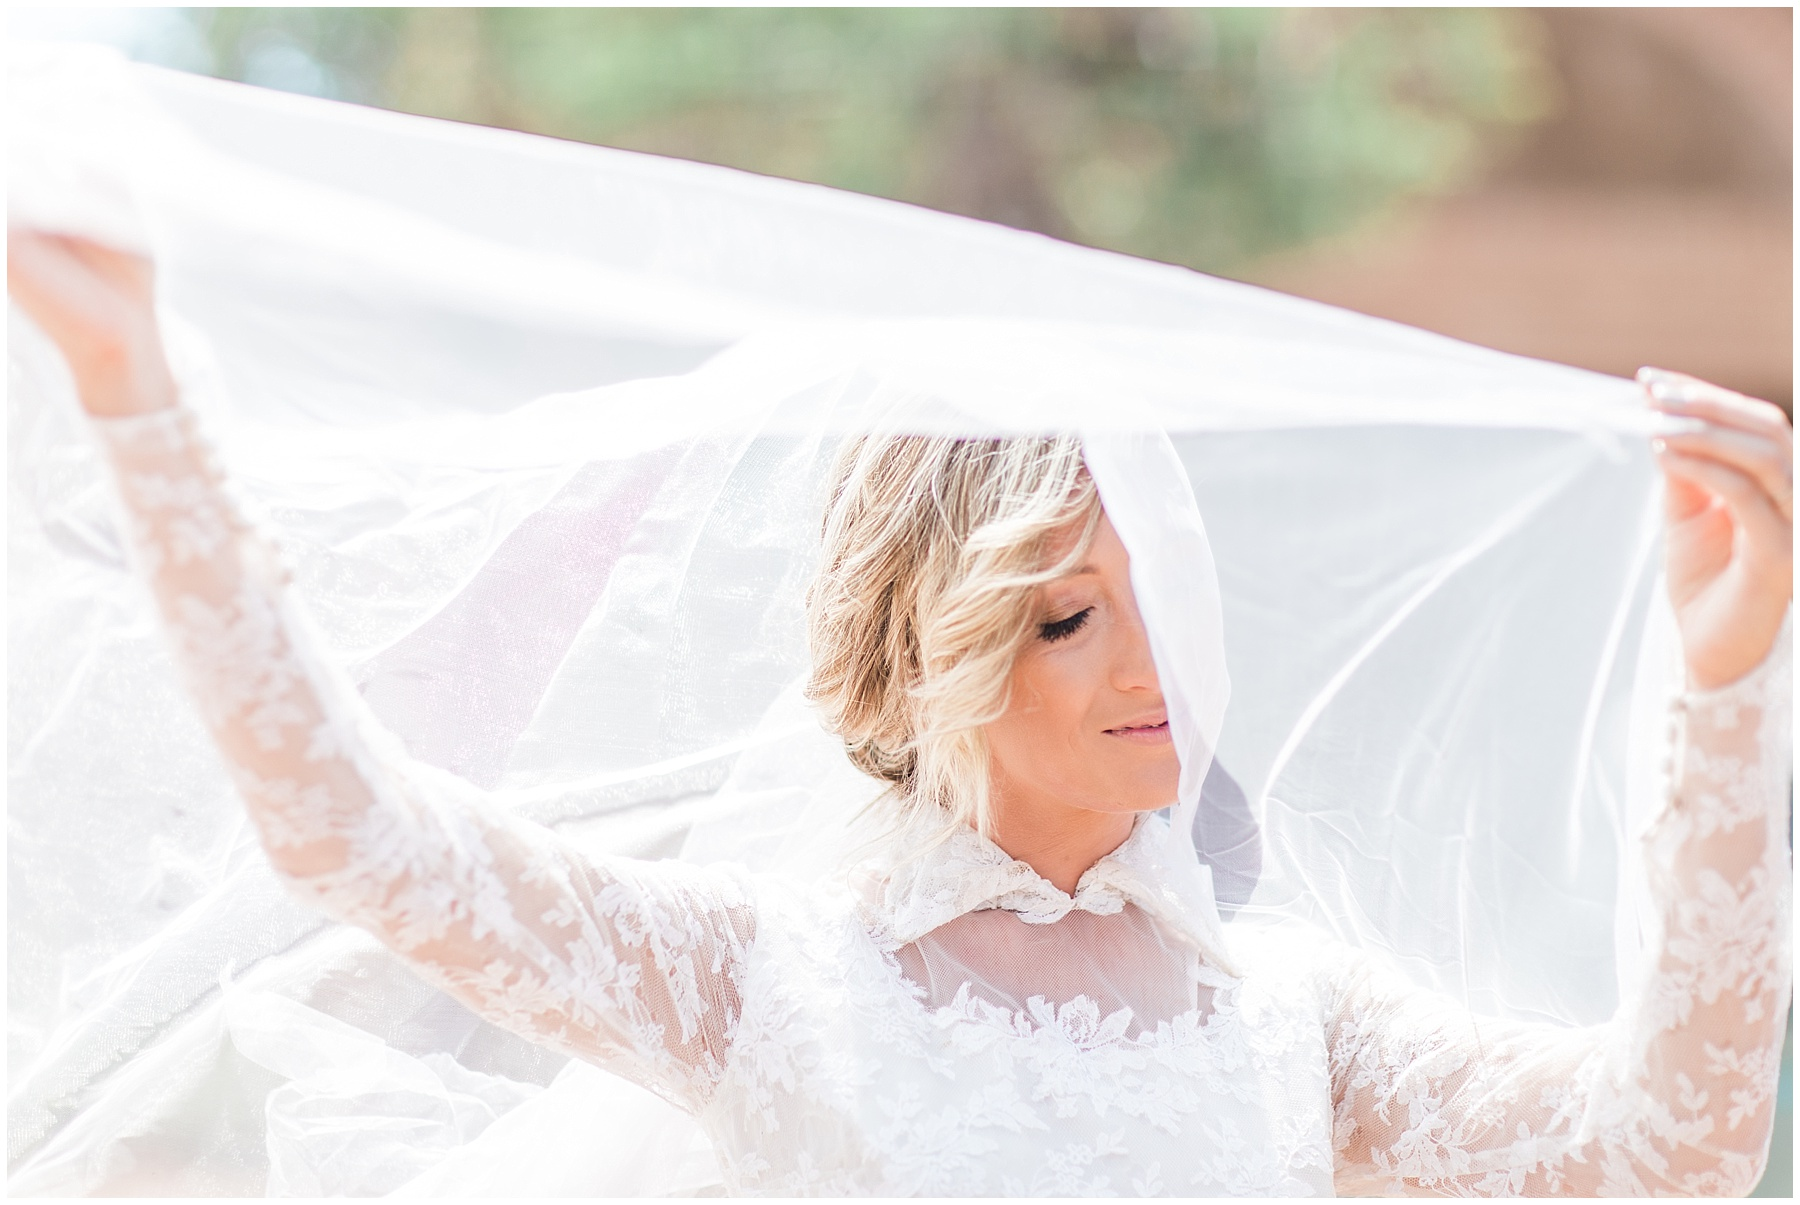 AliciaLandman_JoleneandZander_Wedding_The Pretty Blog_0444.jpg